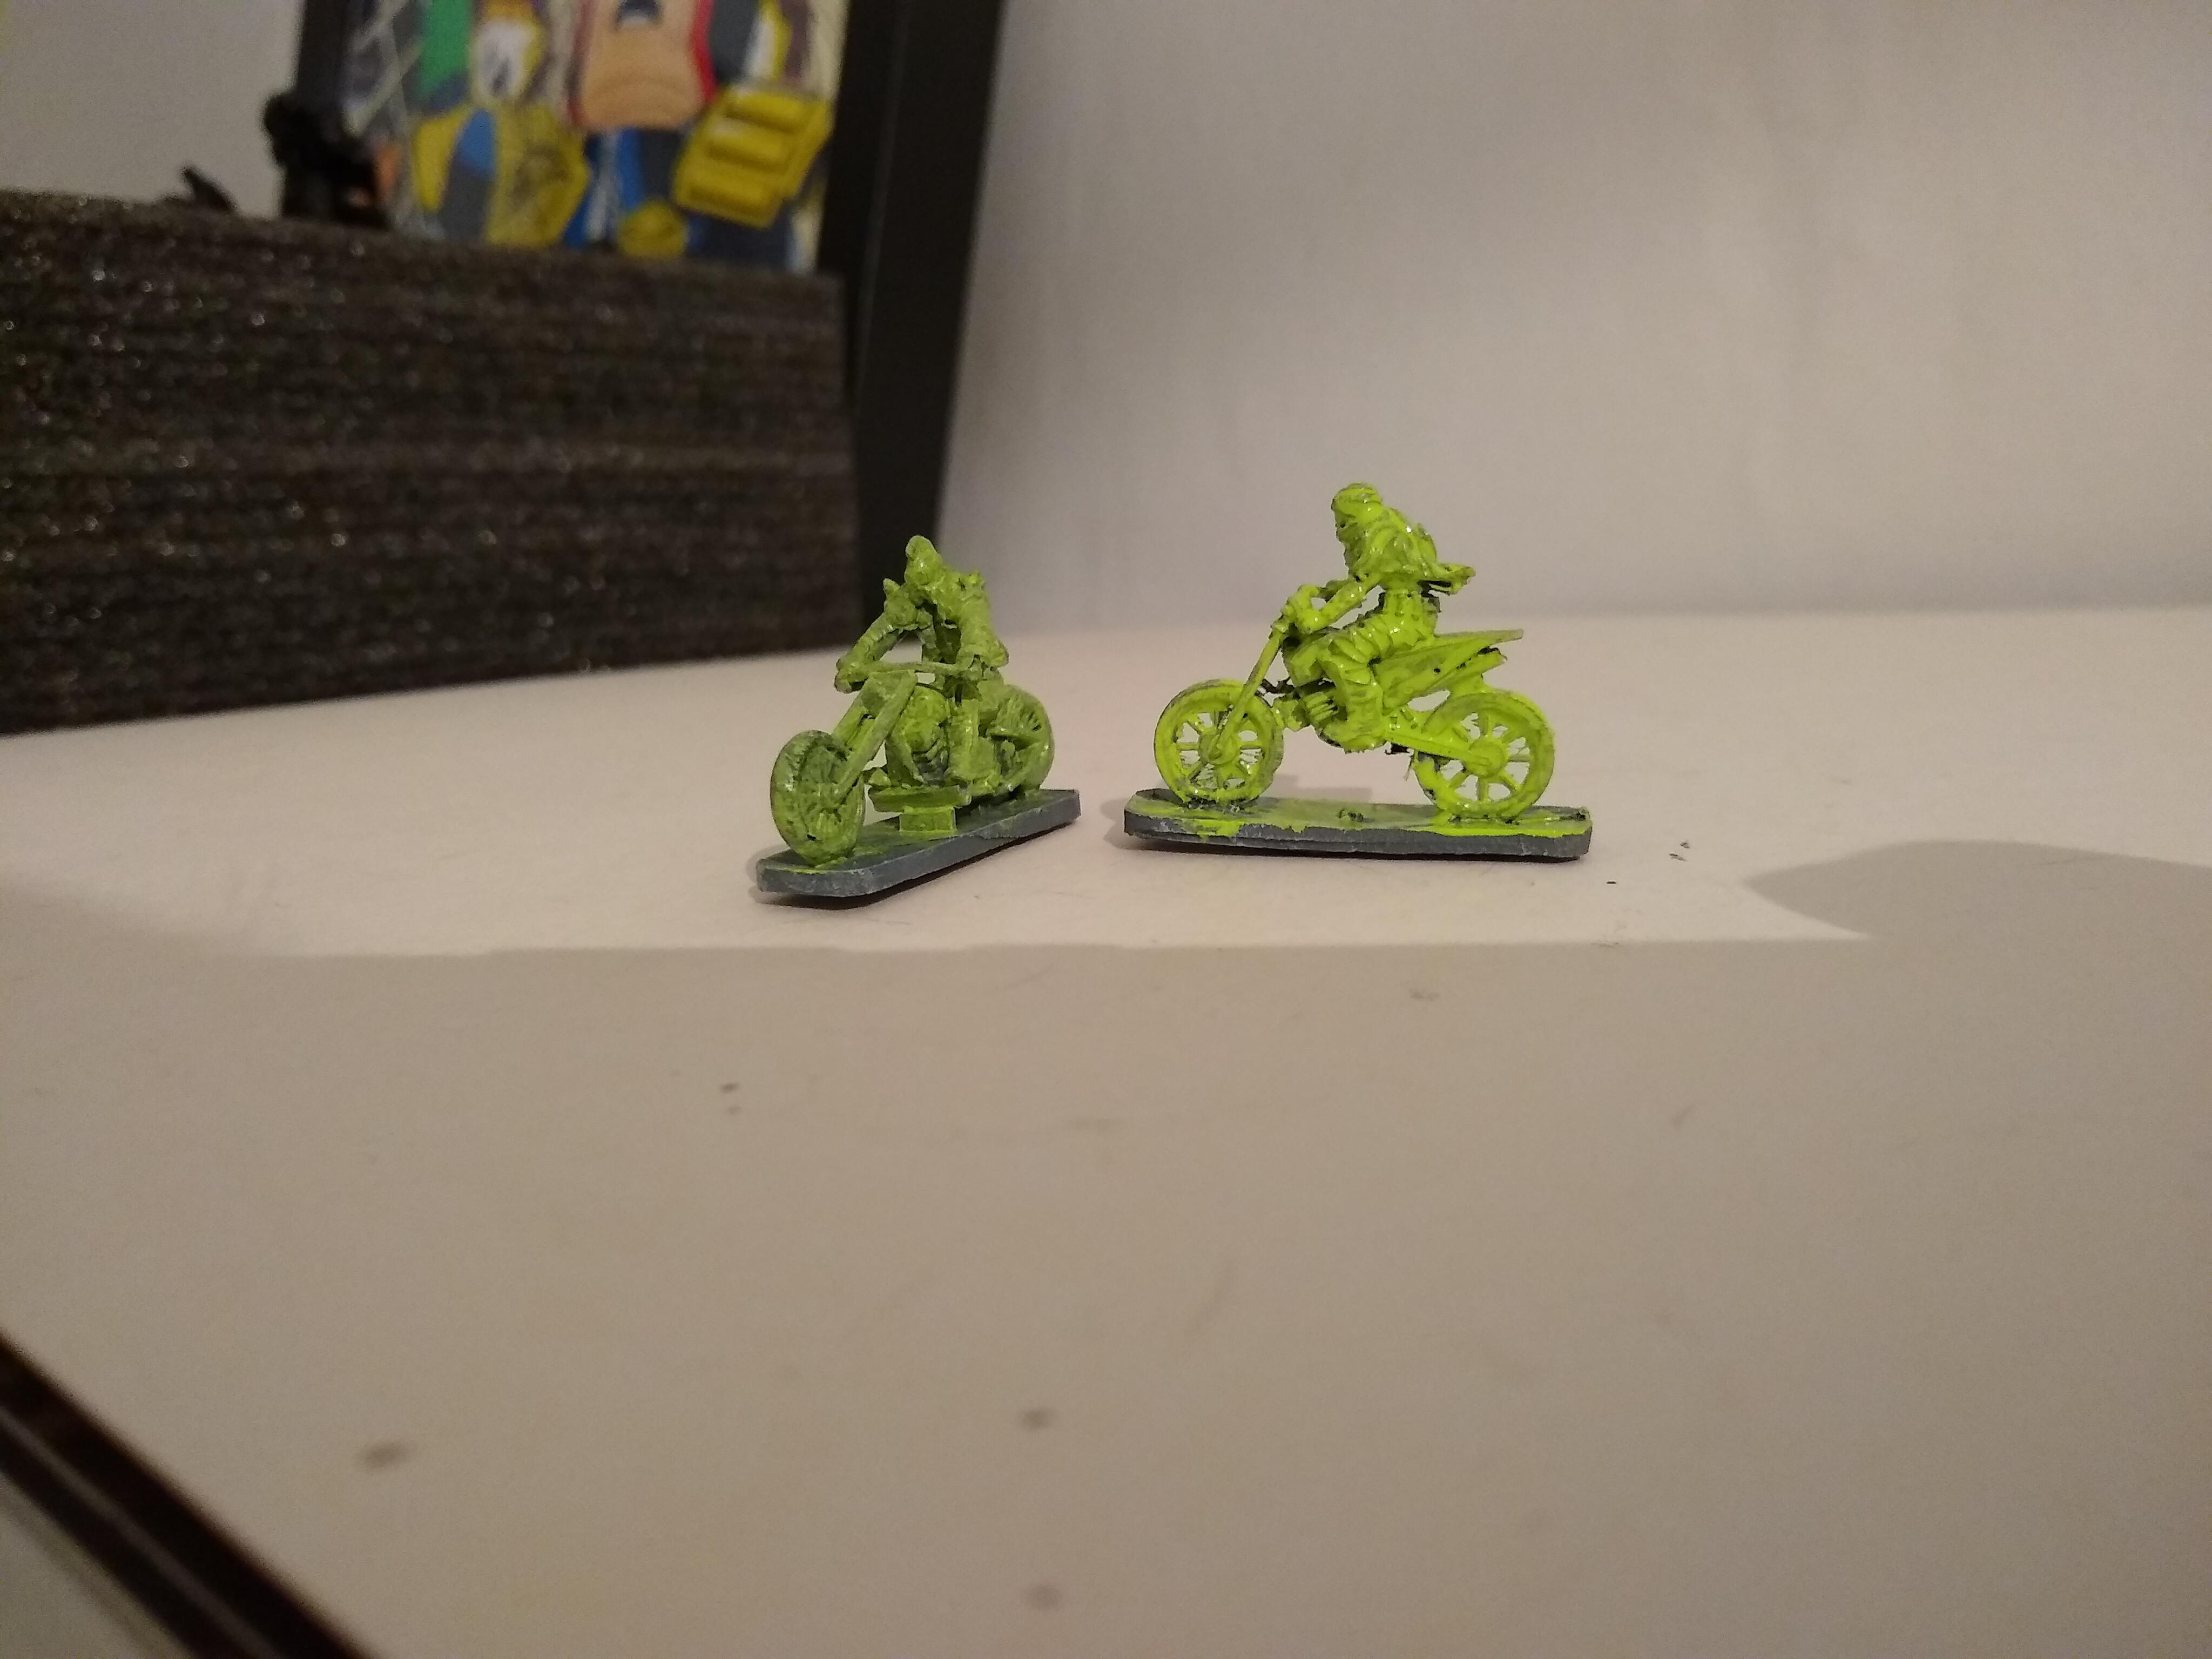 Sticky green ecto bikes